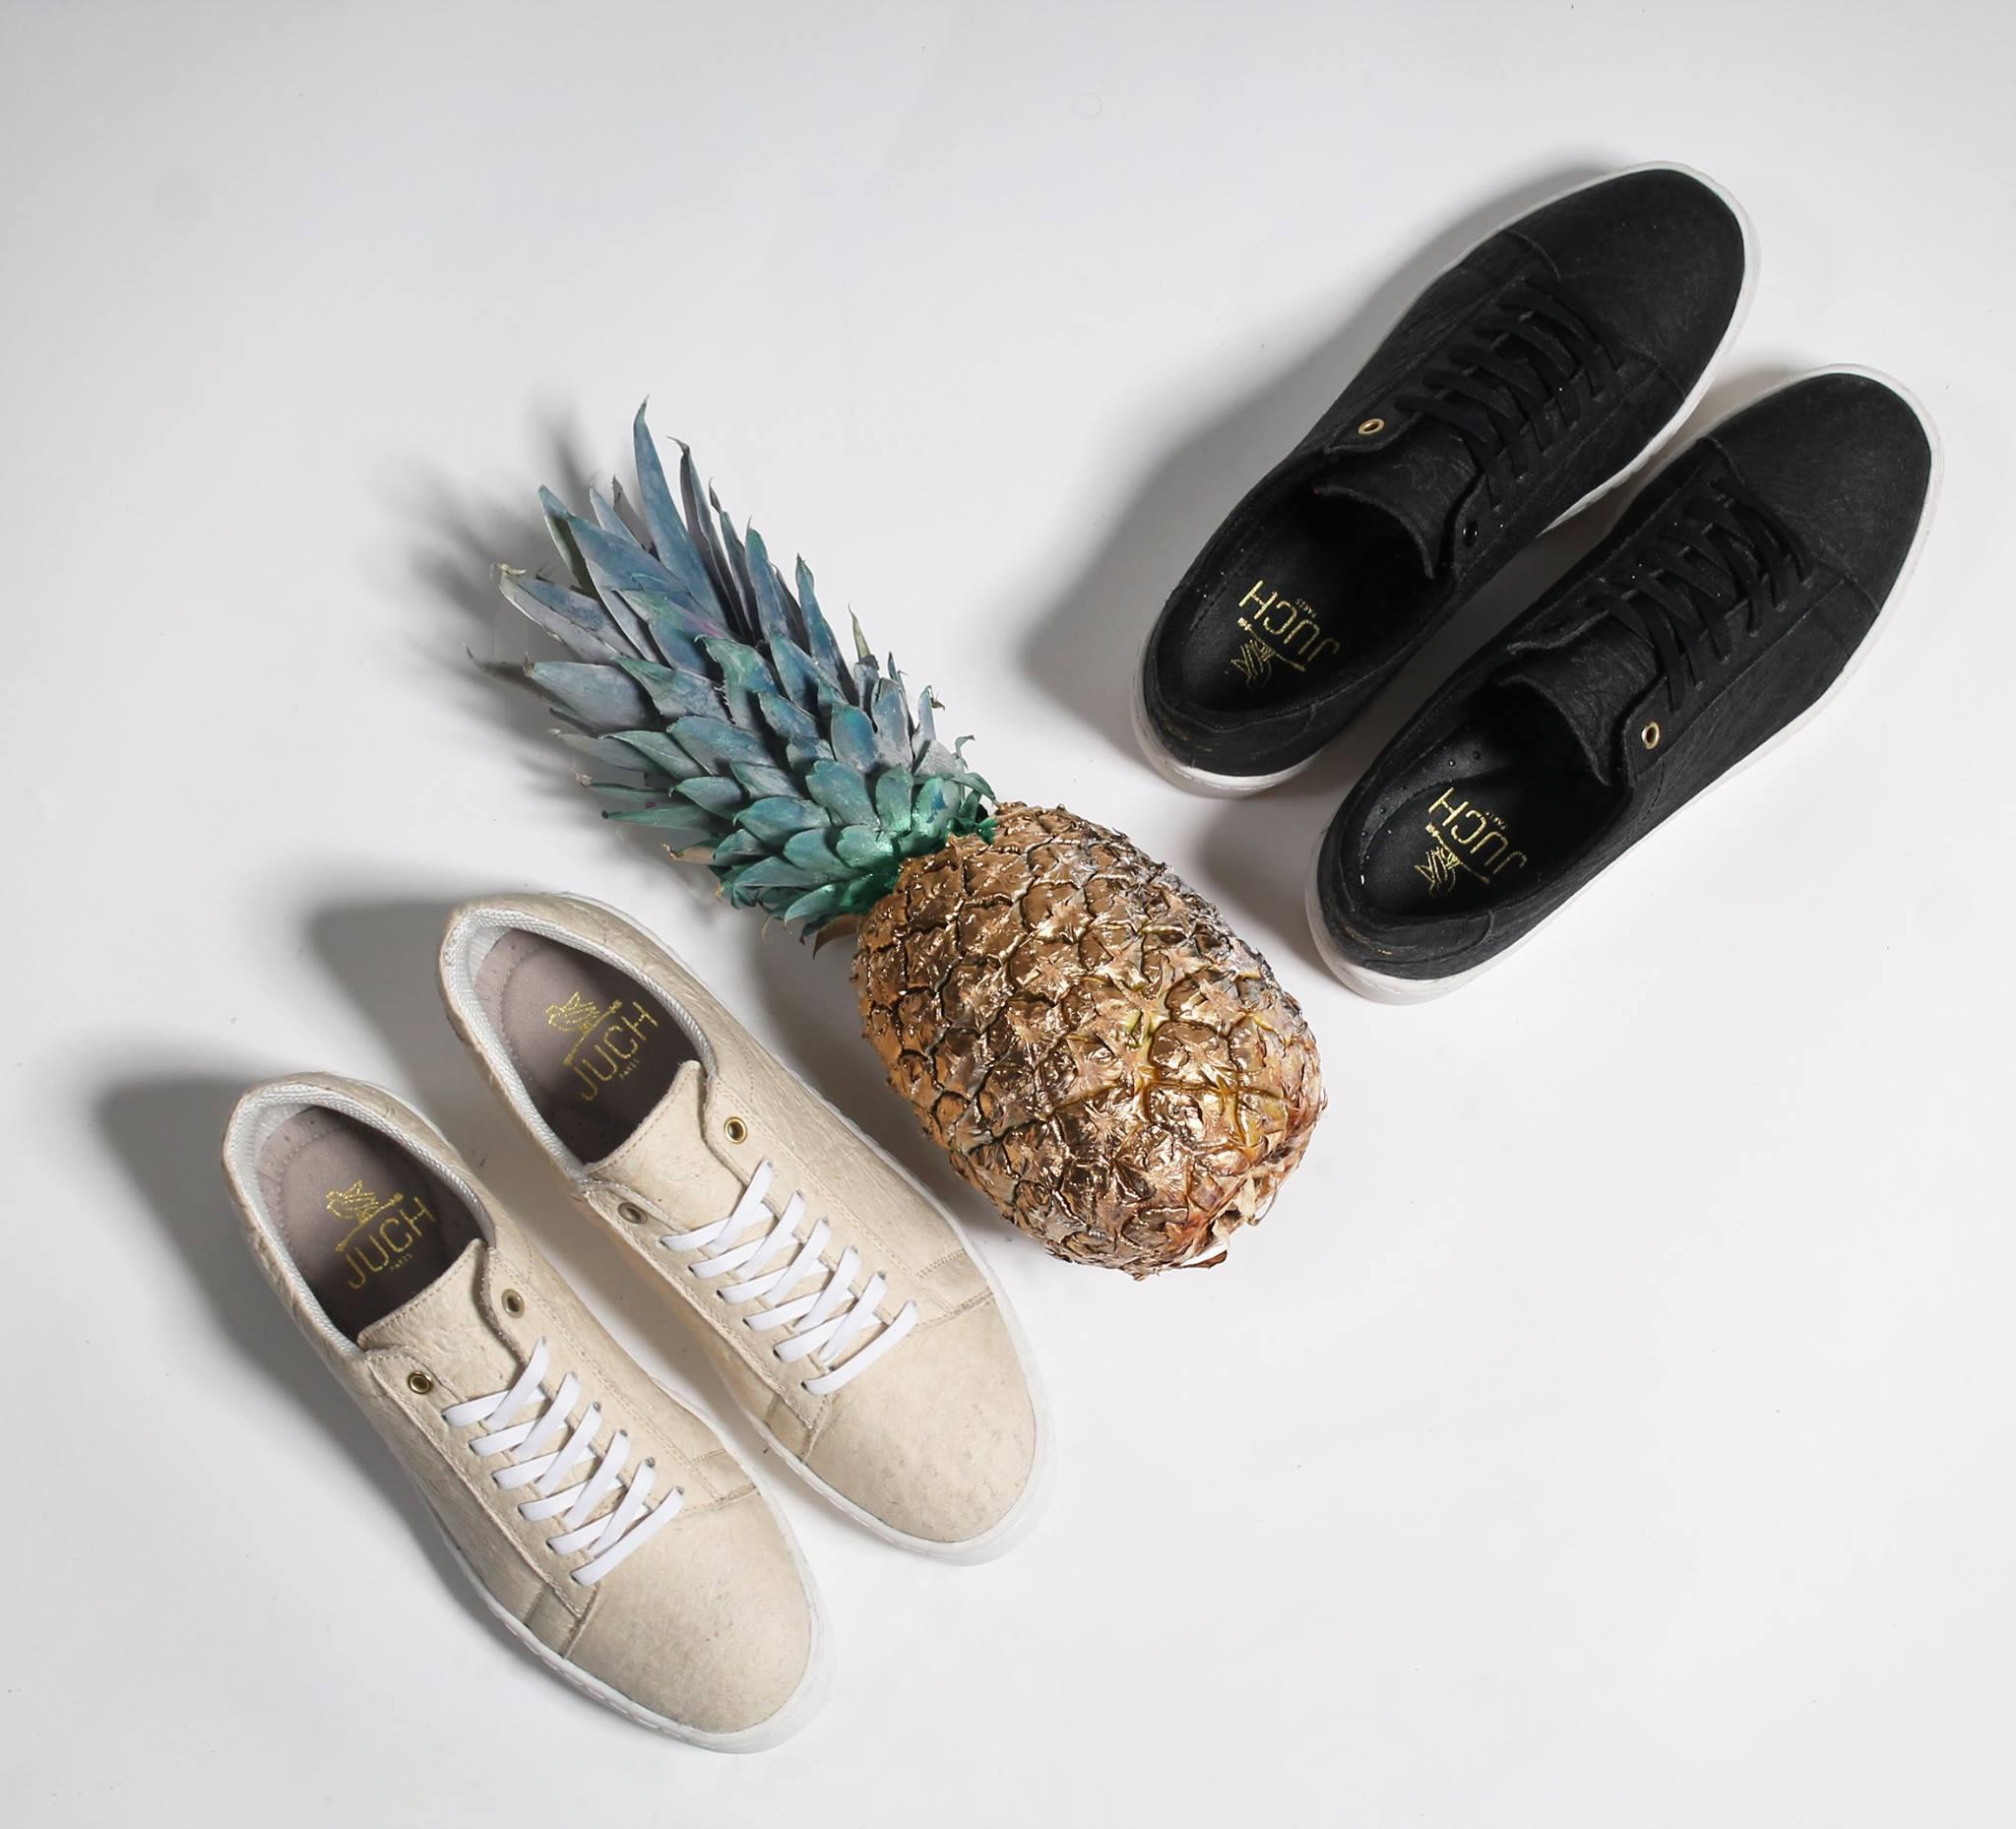 juch-baskets-eco-responsables-en-pinatex-ananas